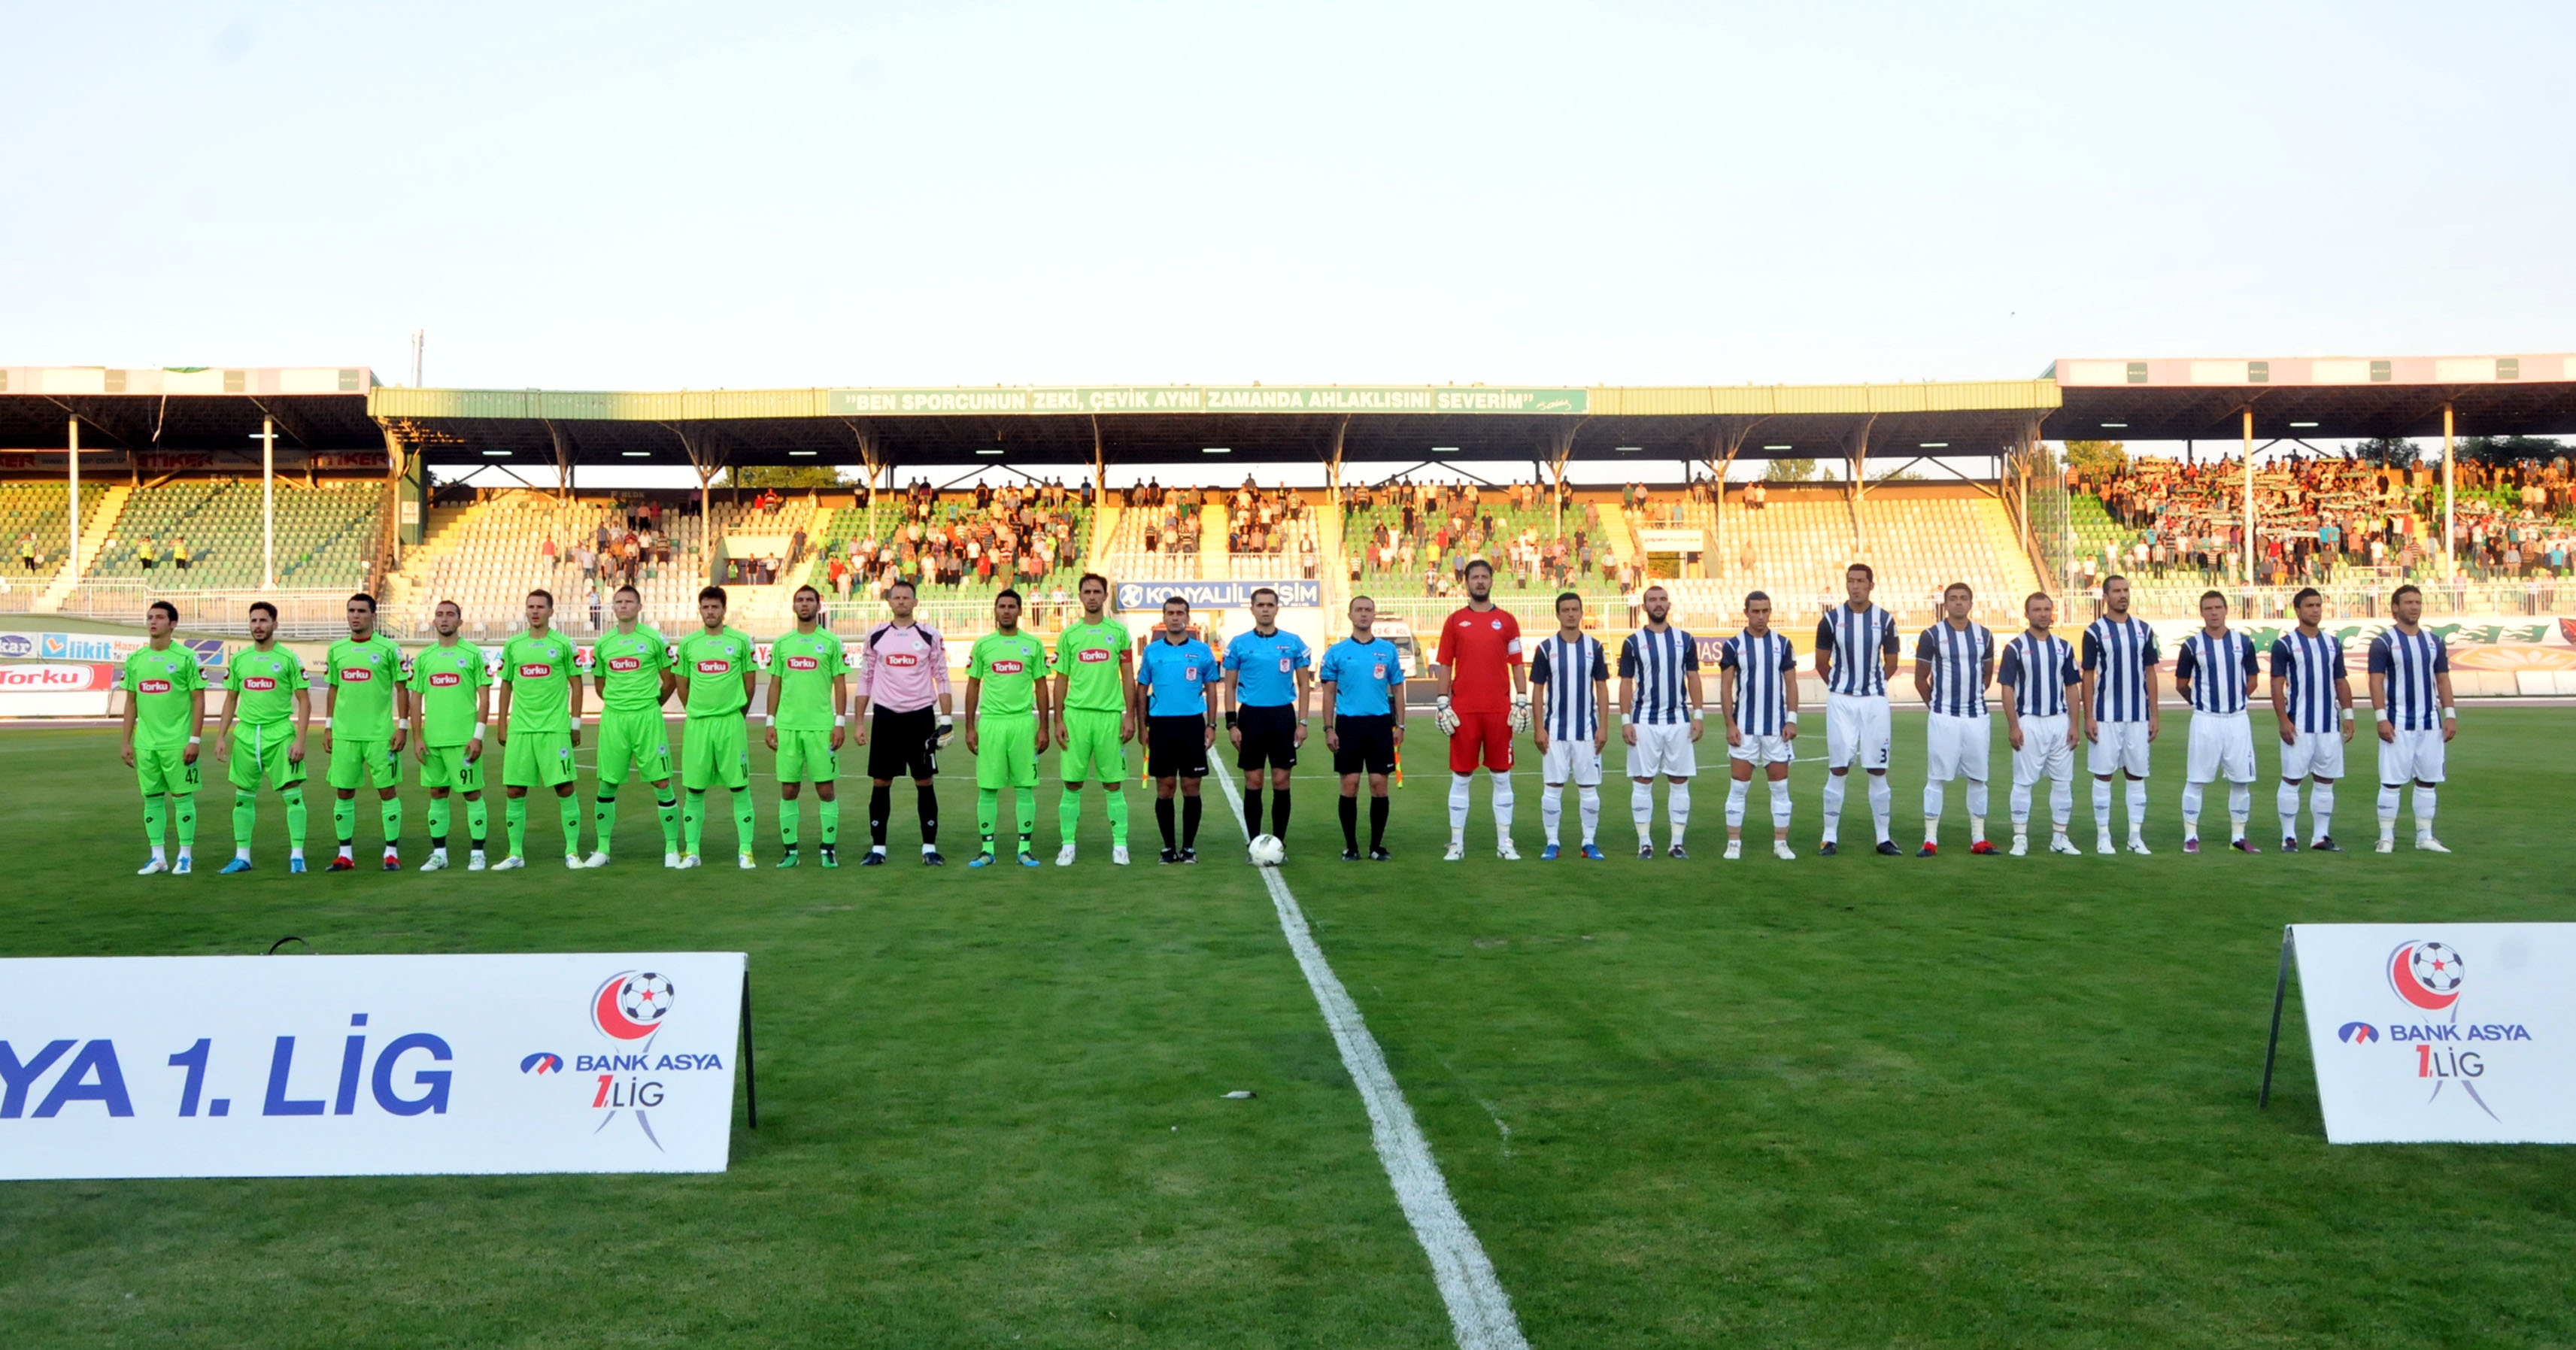 Konyaspor - Kasımpaşa 0-0  Sezon 2011/2012 galerisi resim 9